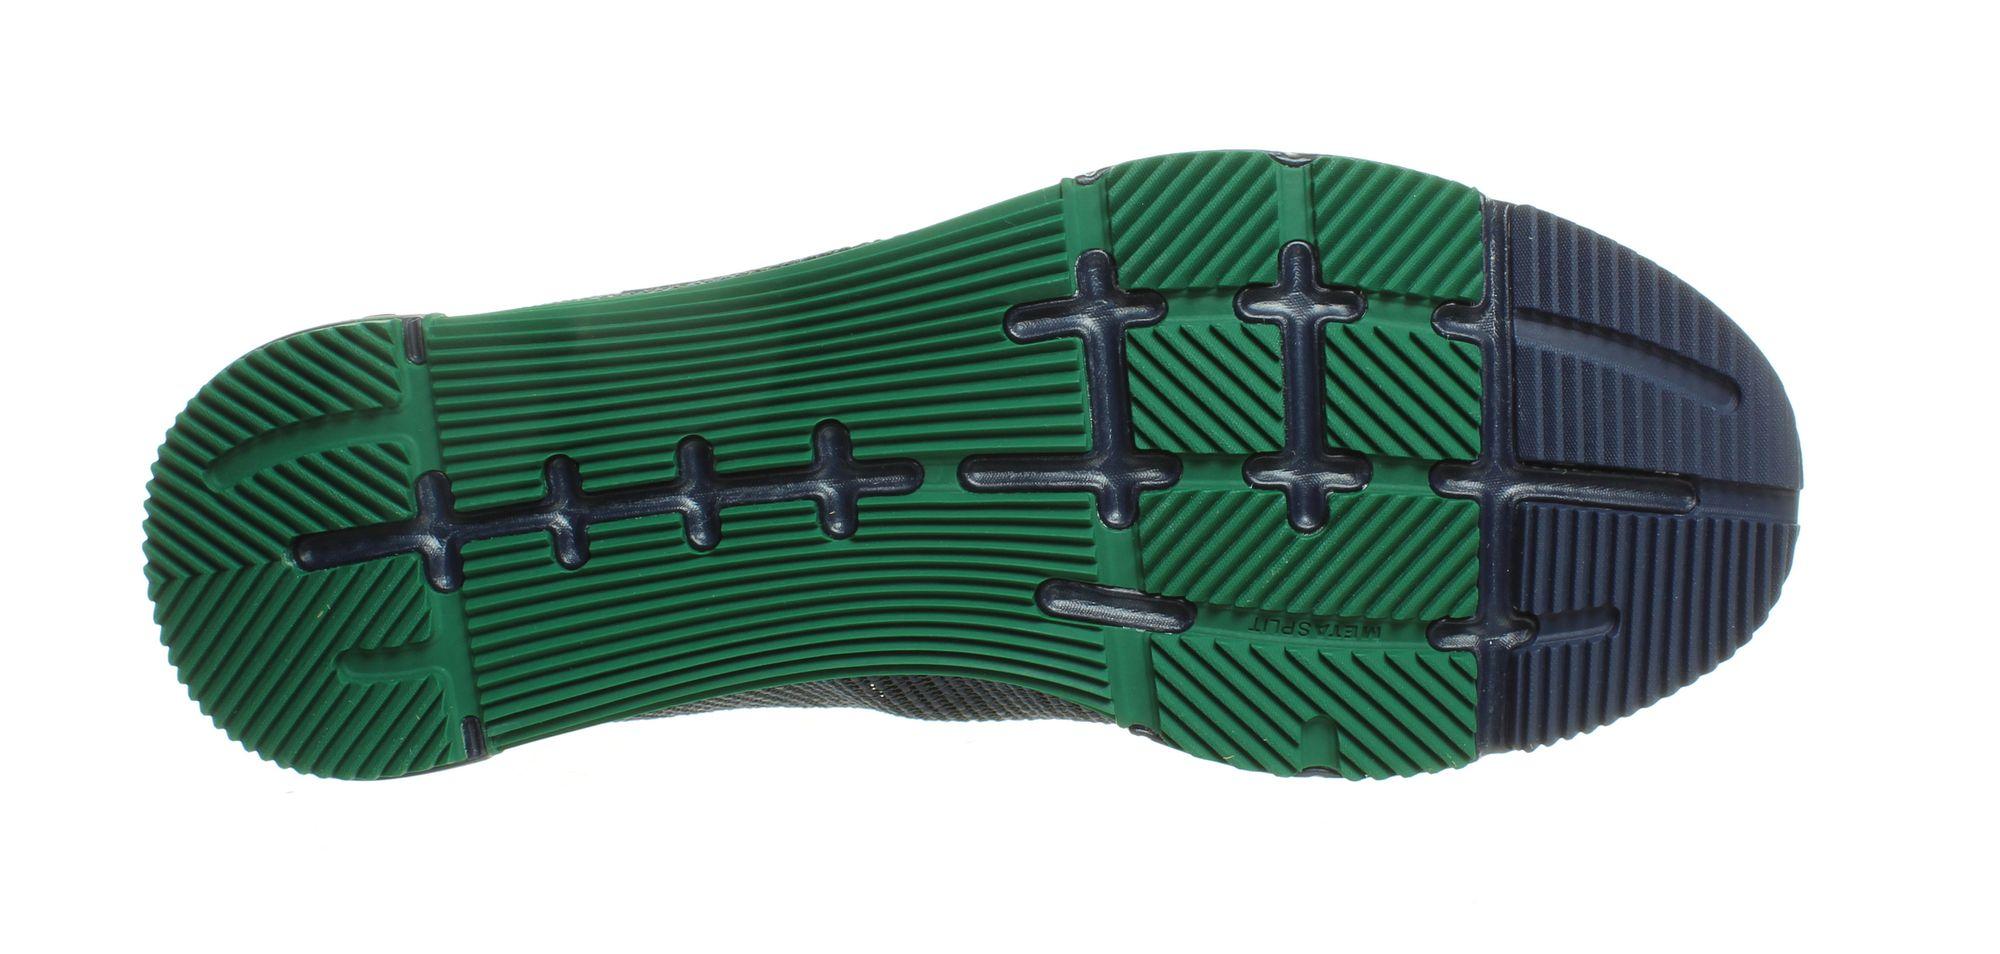 Reebok-Mens-Athletic-Speed-TR-Flexweave-Cross-Training-Shoes thumbnail 17